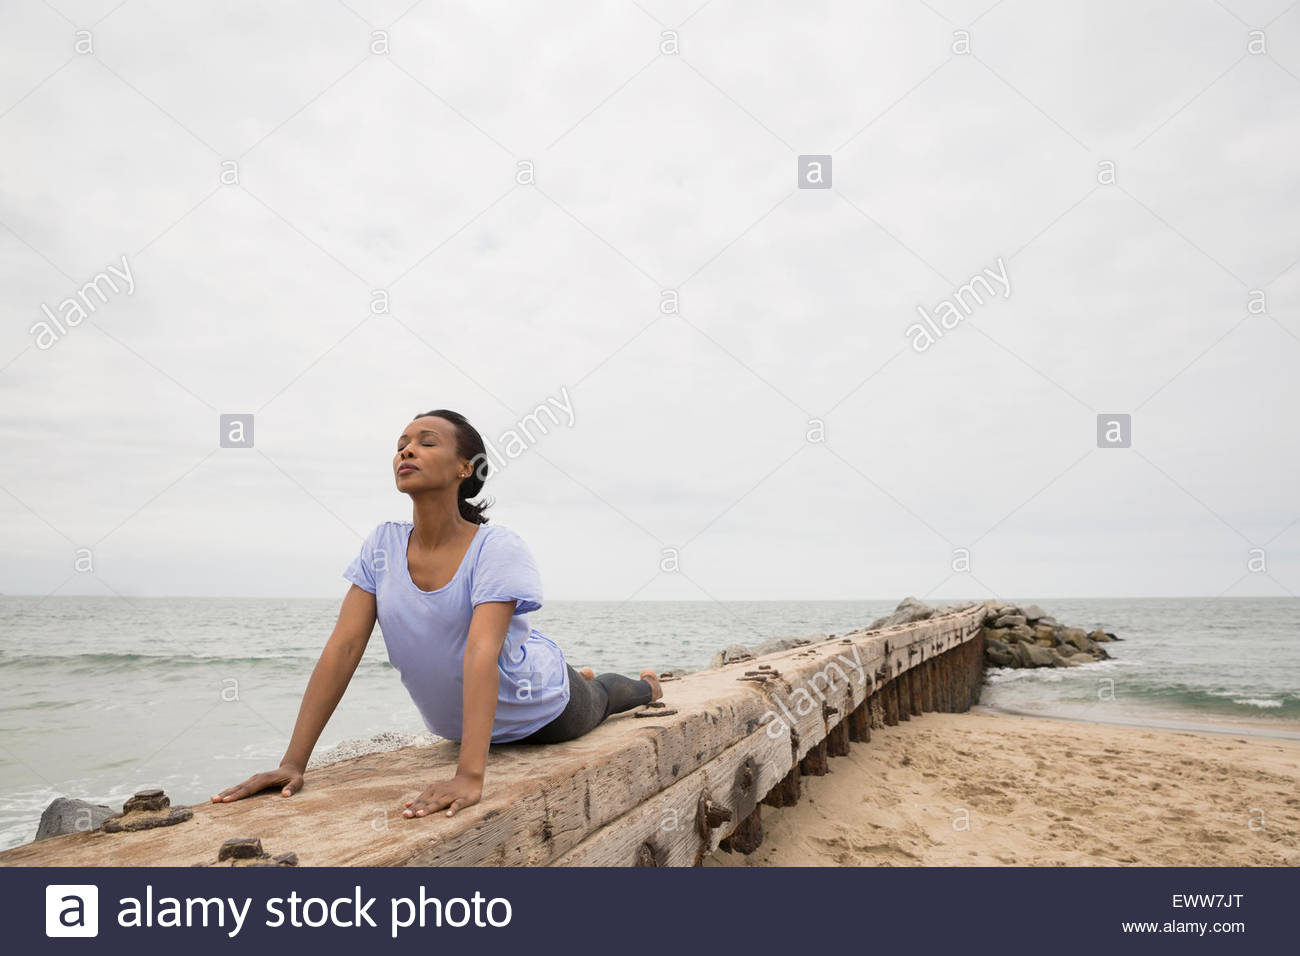 Serene woman in upward facing dog position beach - Stock Image